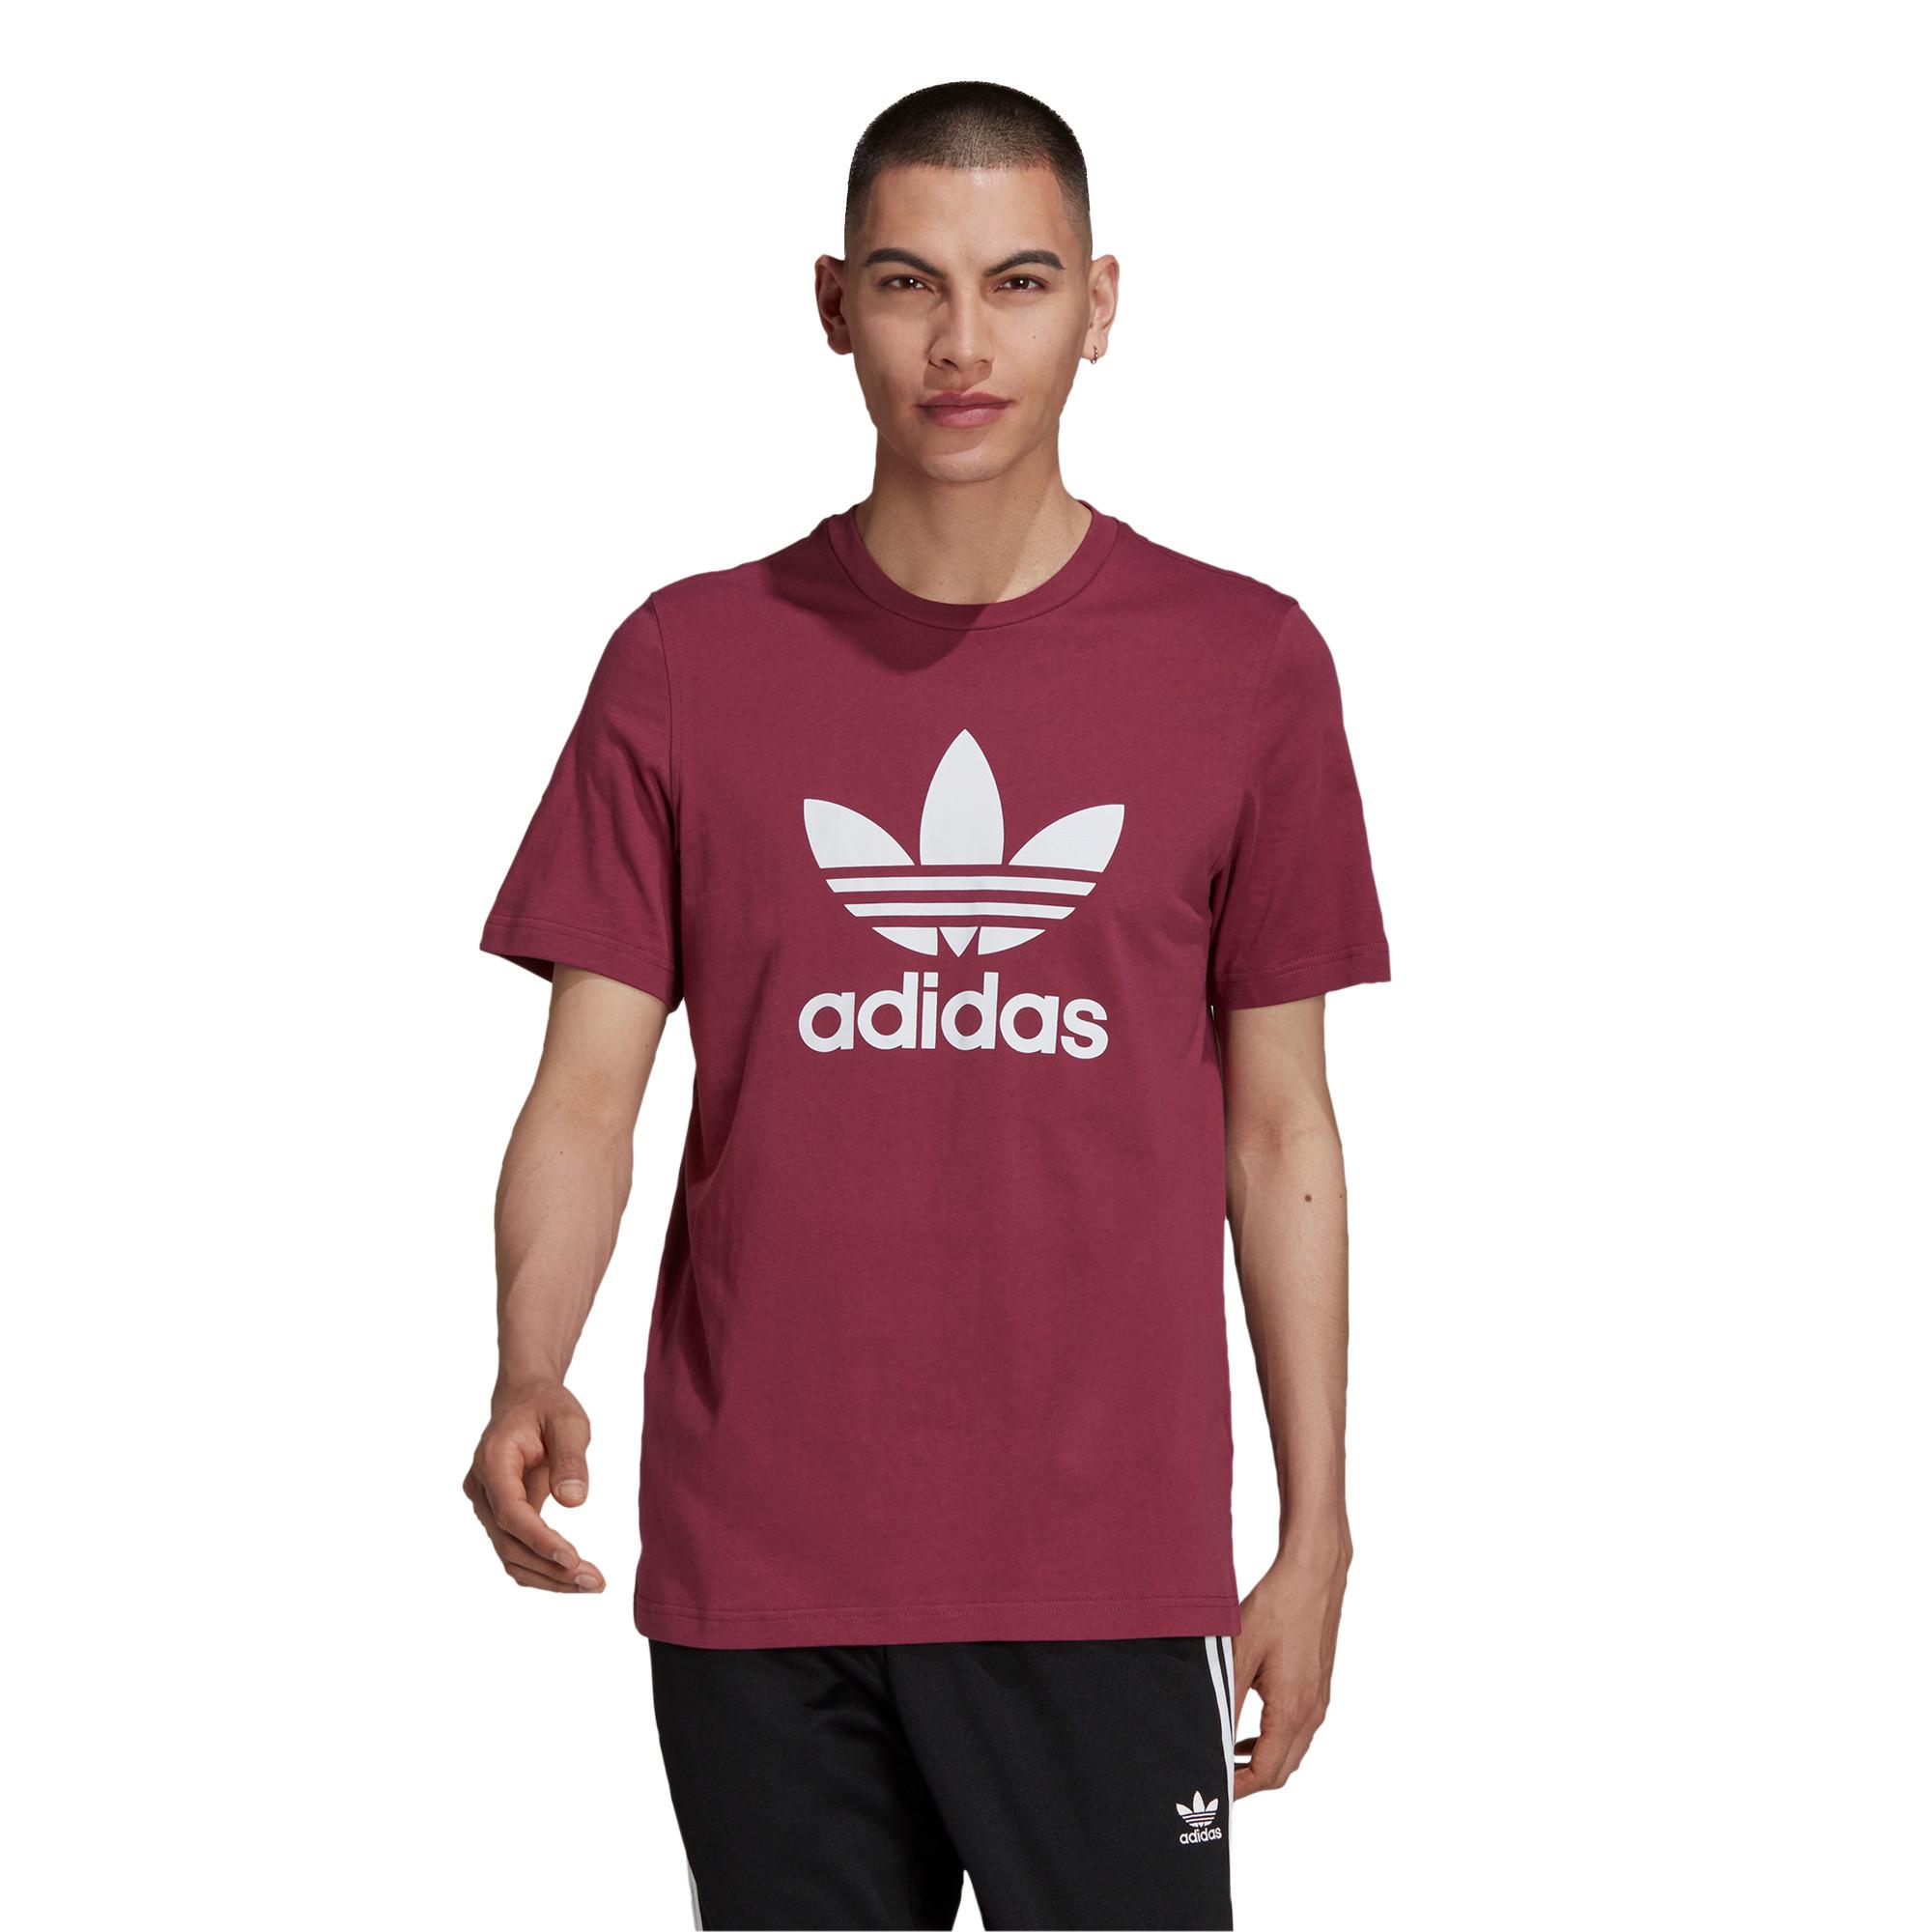 T-shirt uomo adicolor Classics Trefoil, Bianco/Rosso, large image number 2